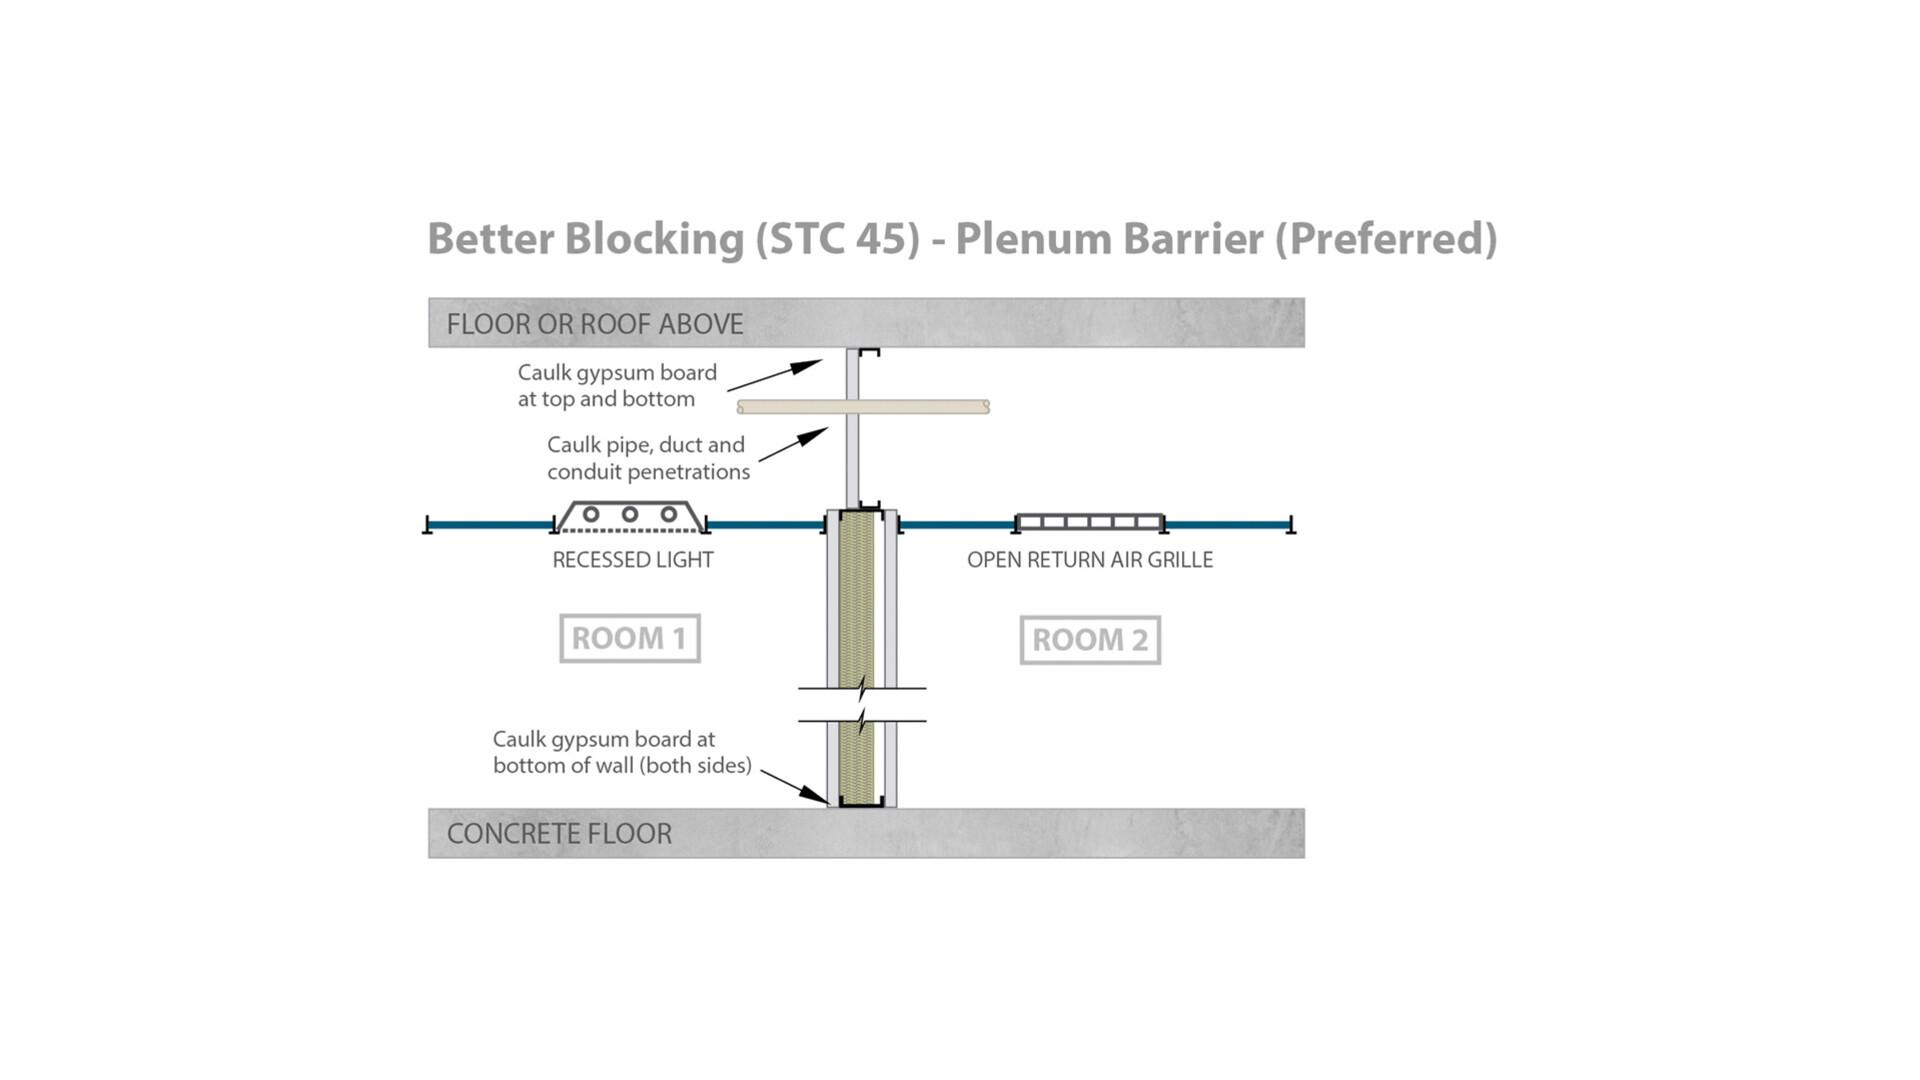 RFN-NA, optimized acoustics, better sound blocking, STC 45 plenum barrier